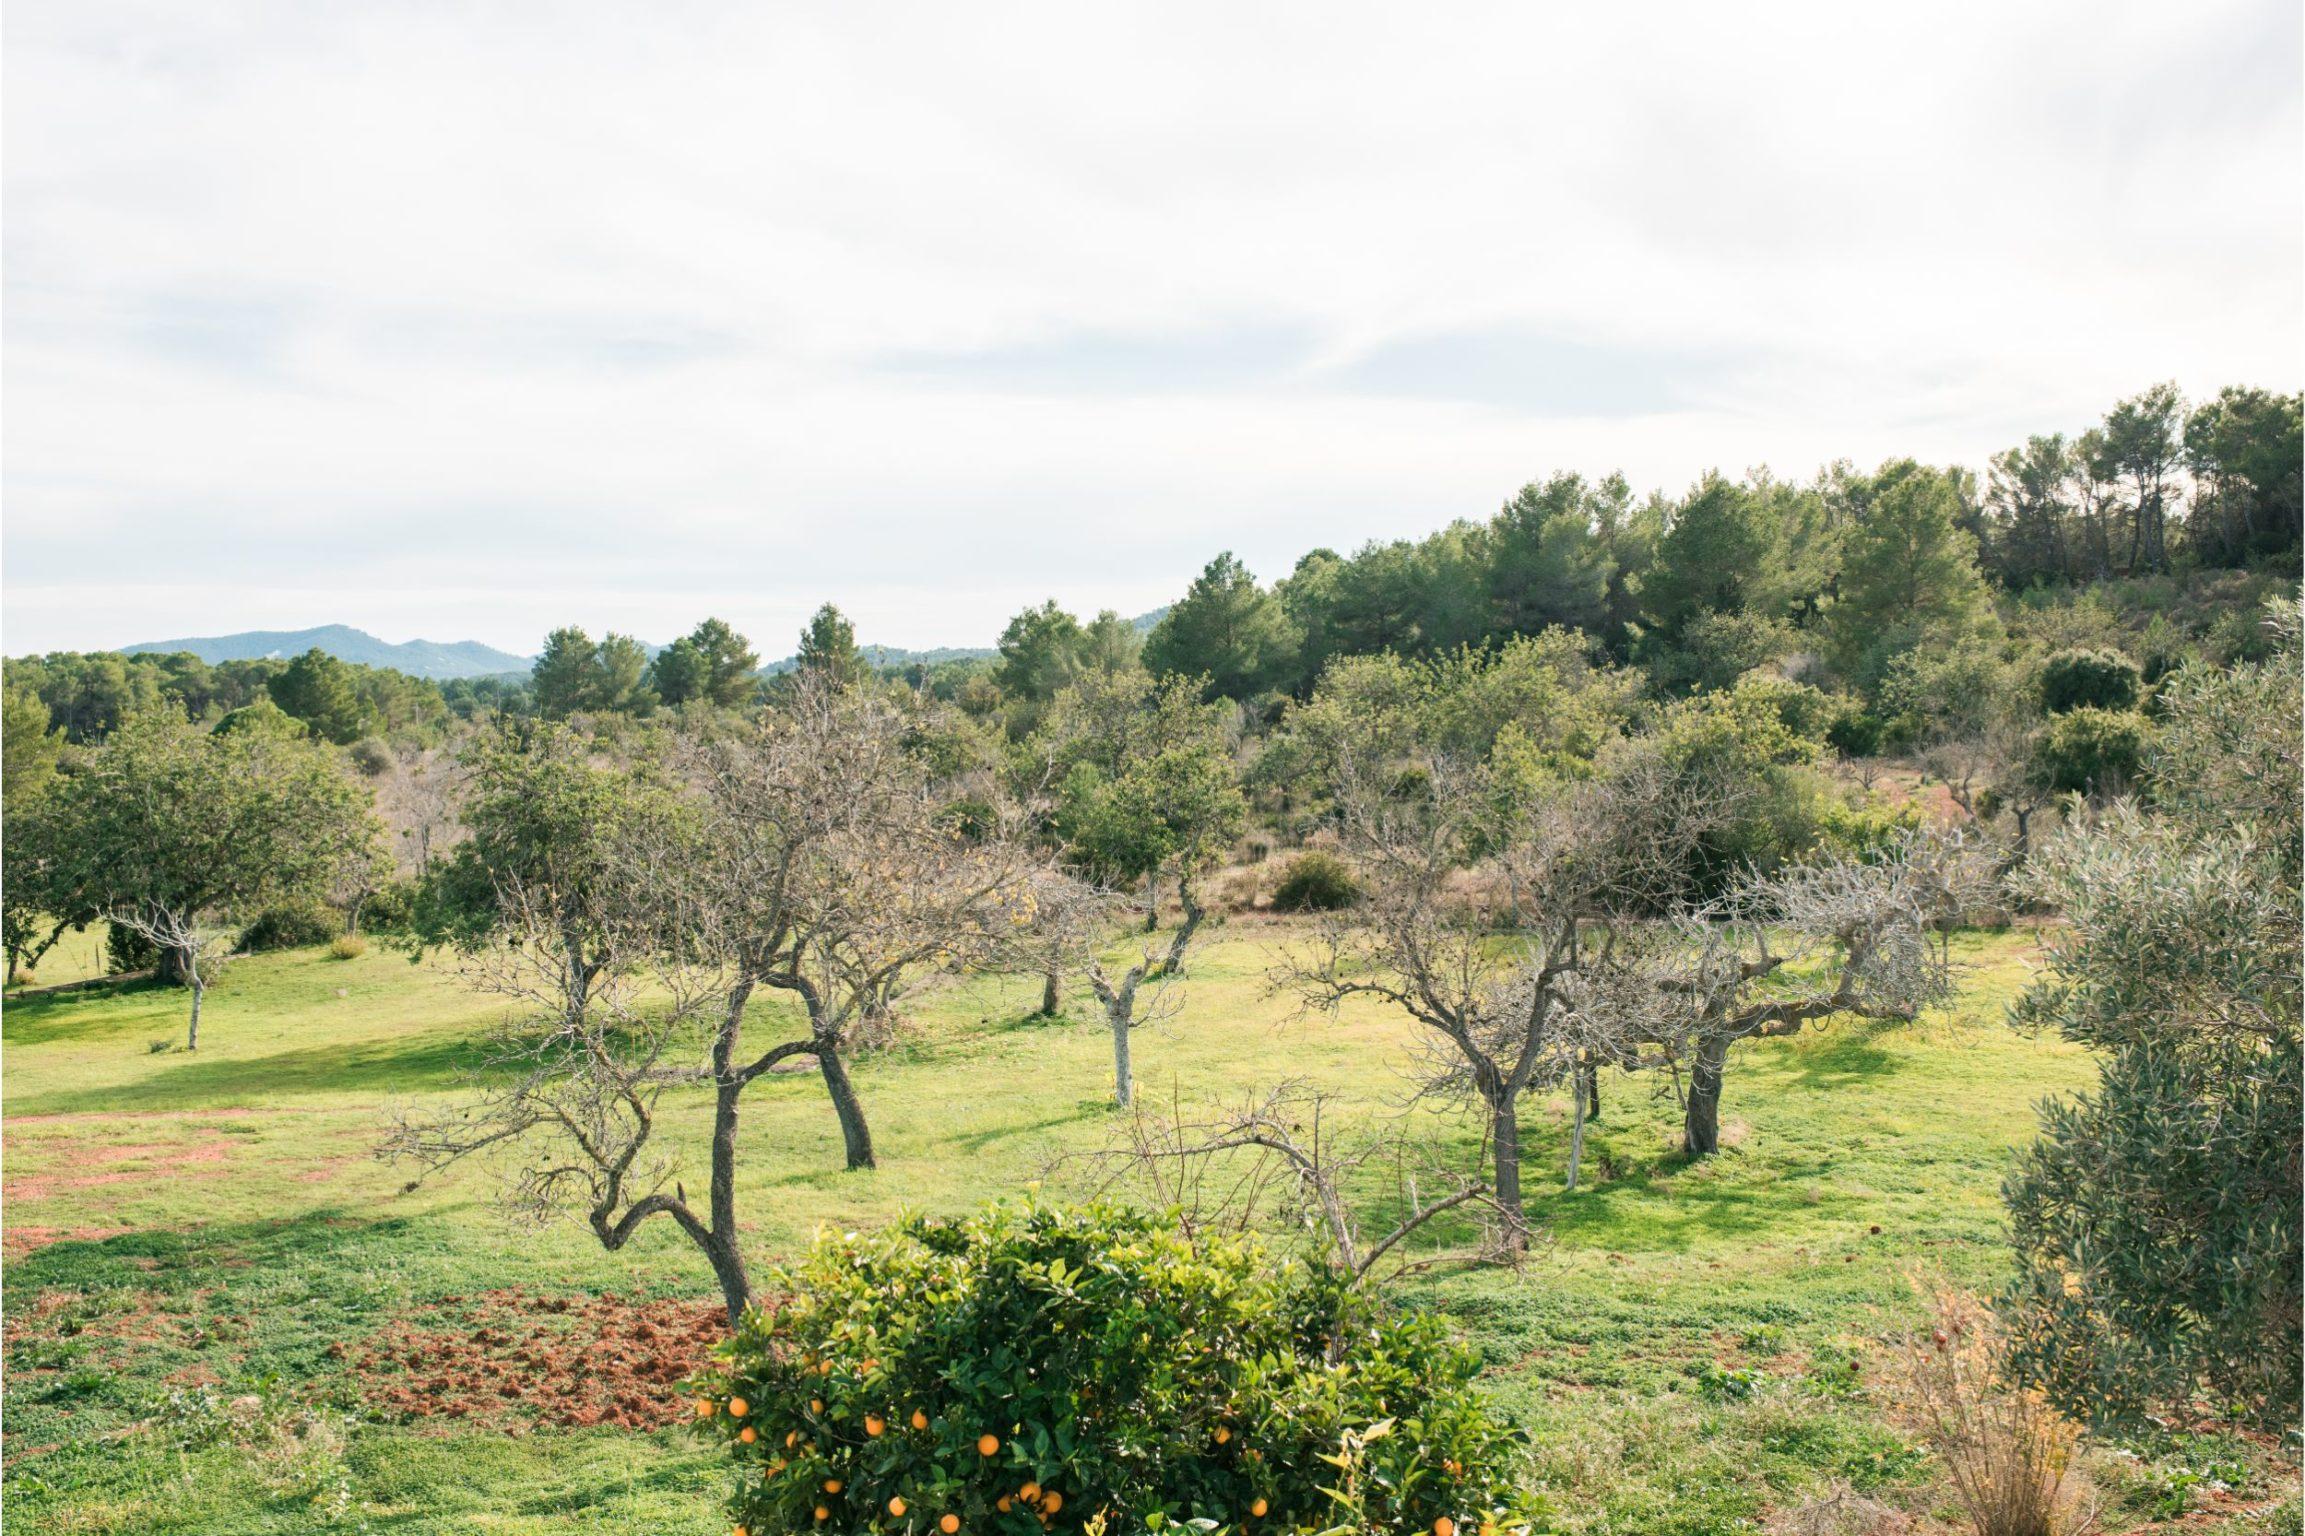 https://www.white-ibiza.com/wp-content/uploads/2020/02/white-ibiza-villas-villa-balafia-outdoors-countryside-2305x1536.jpg